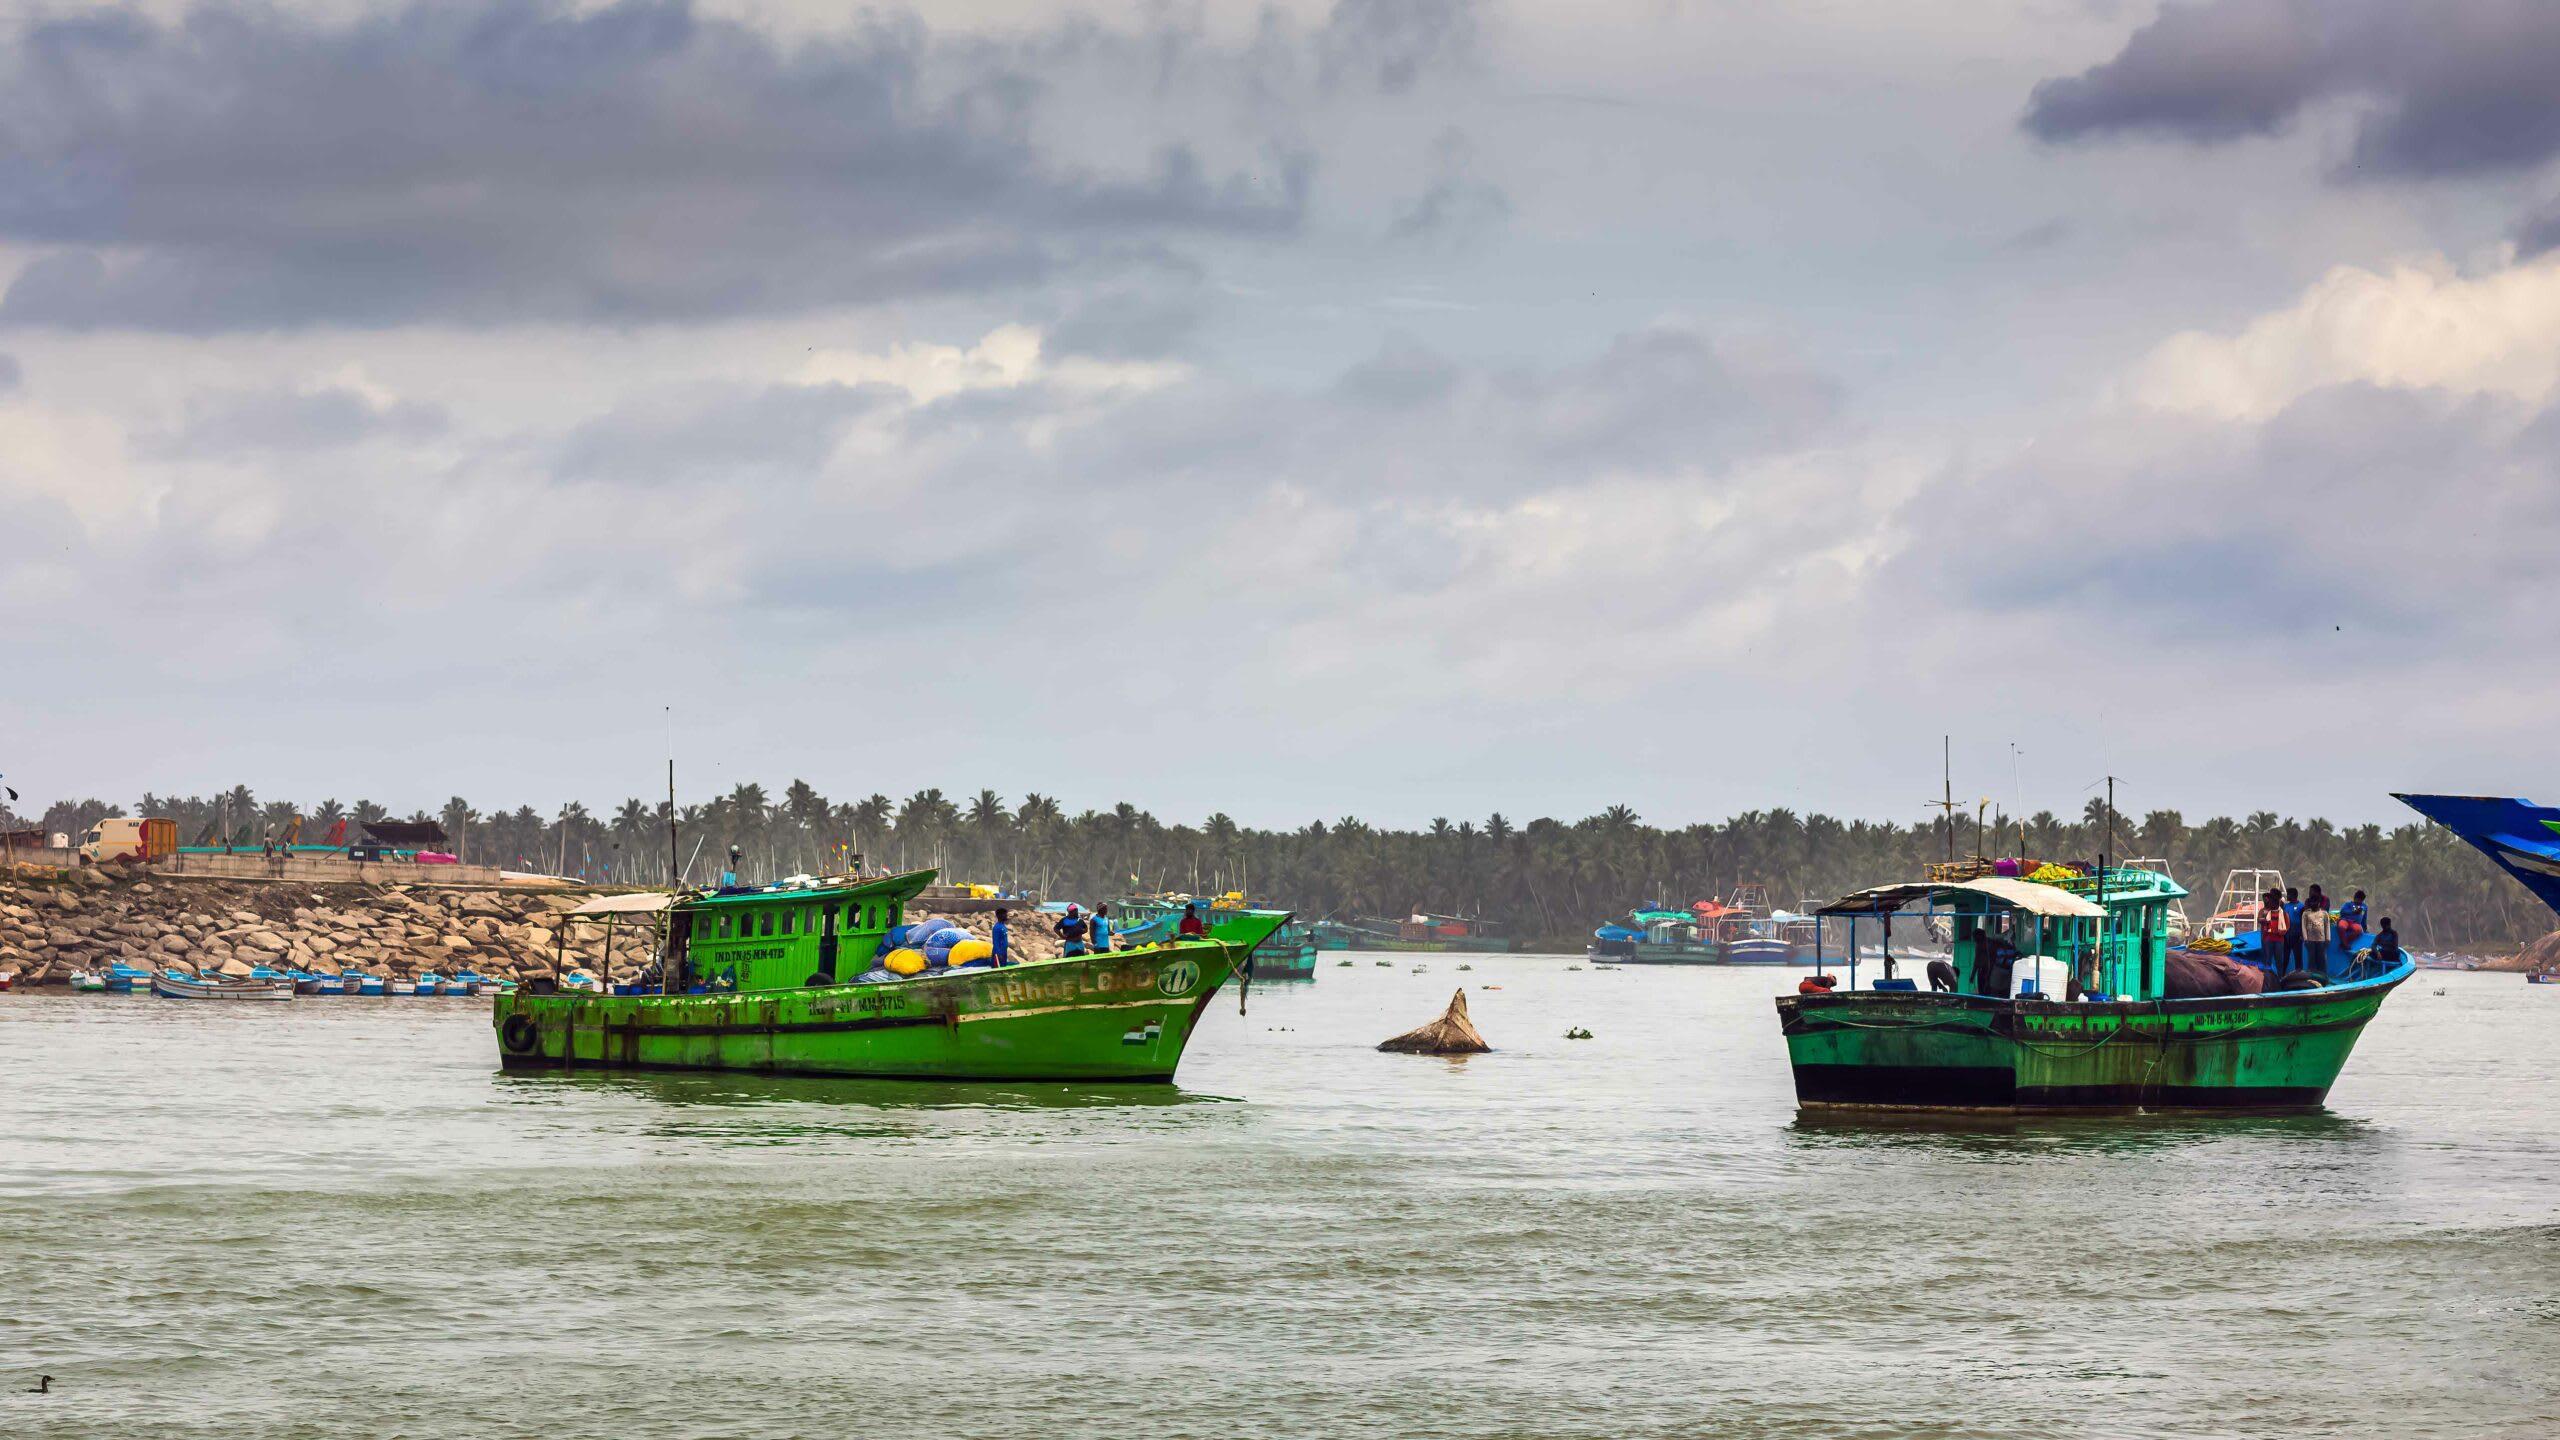 Trawl boats near Thengapattanam harbour along the coast of Kanyakumari in south India. Photo: AFZAL KHAN MAHEEN/Shutterstock